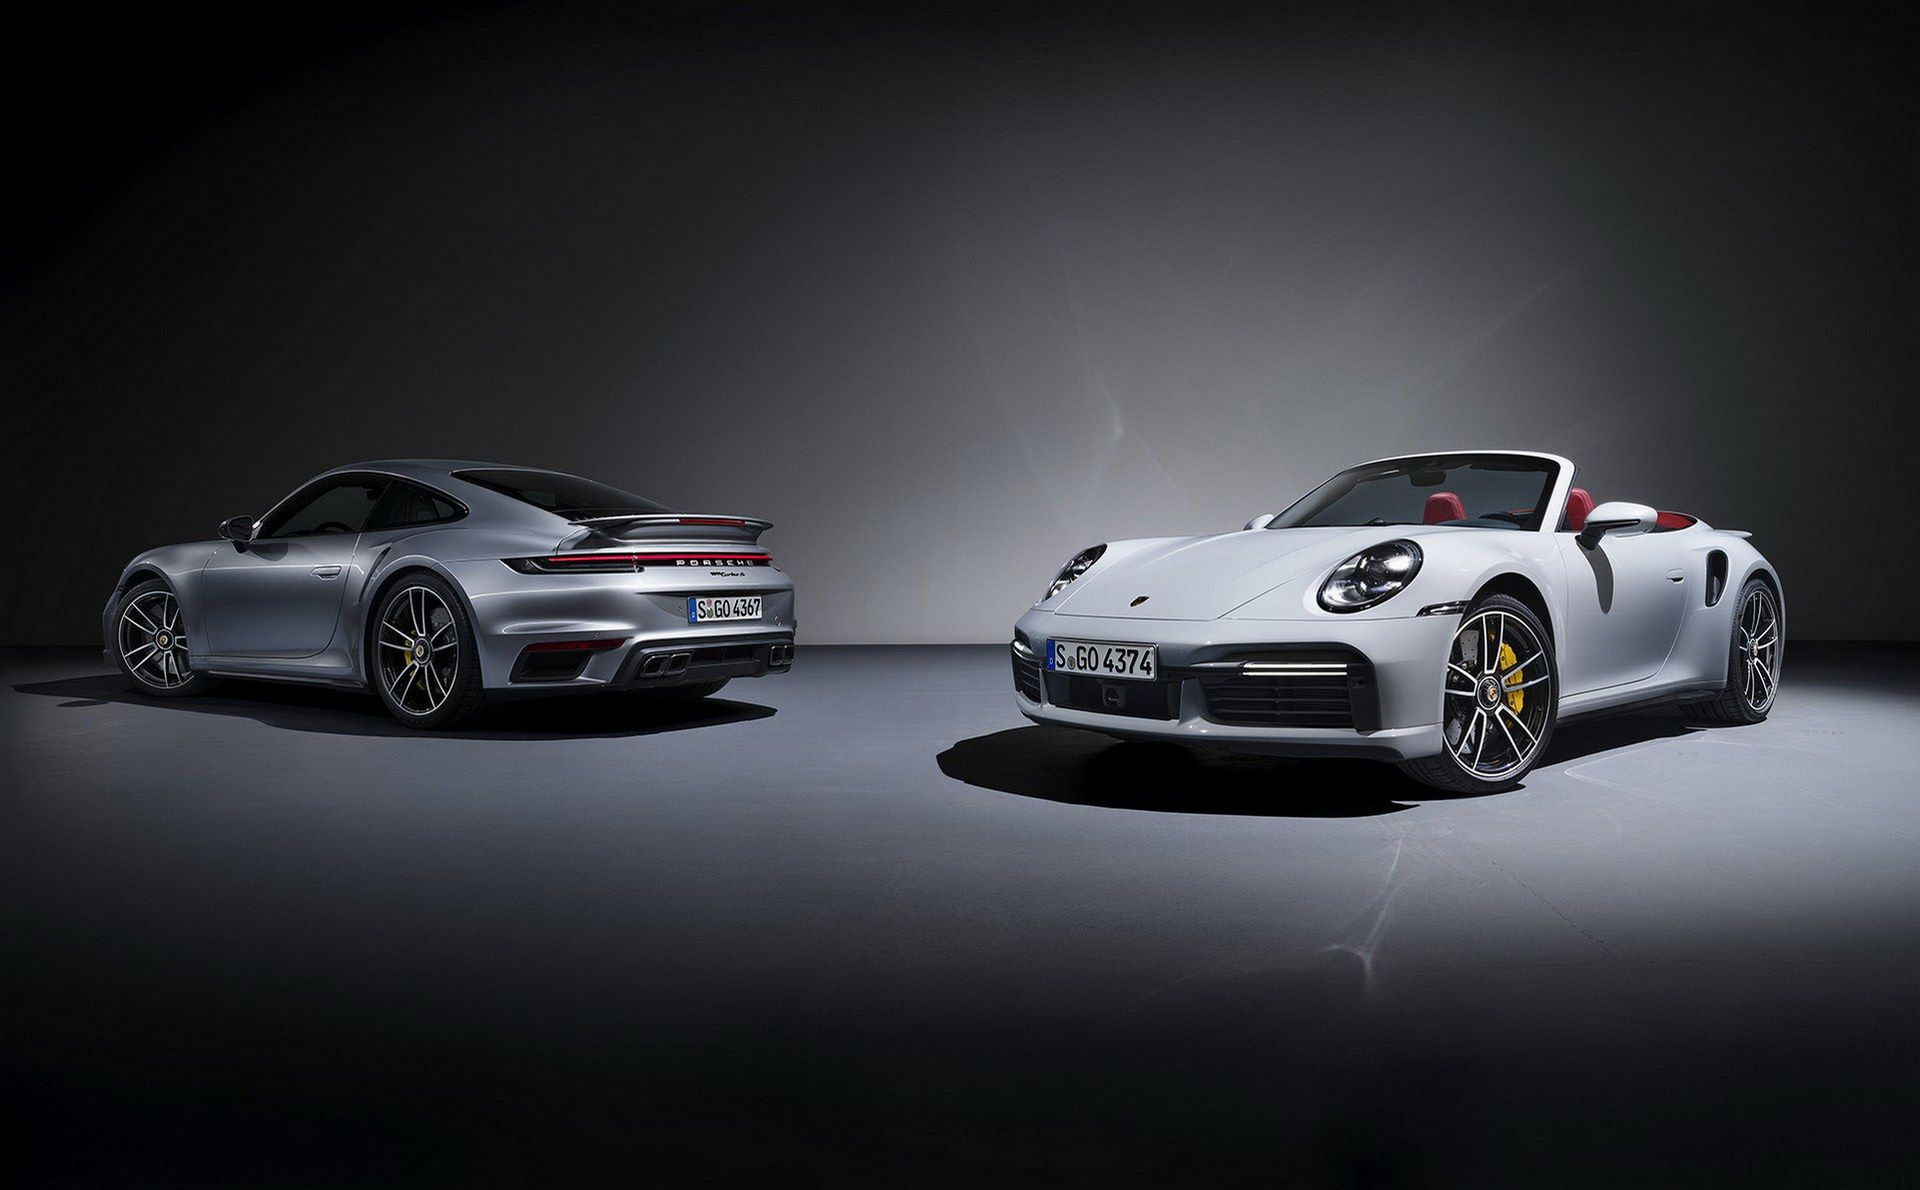 Porsche-911-Turbo-S-2020-8